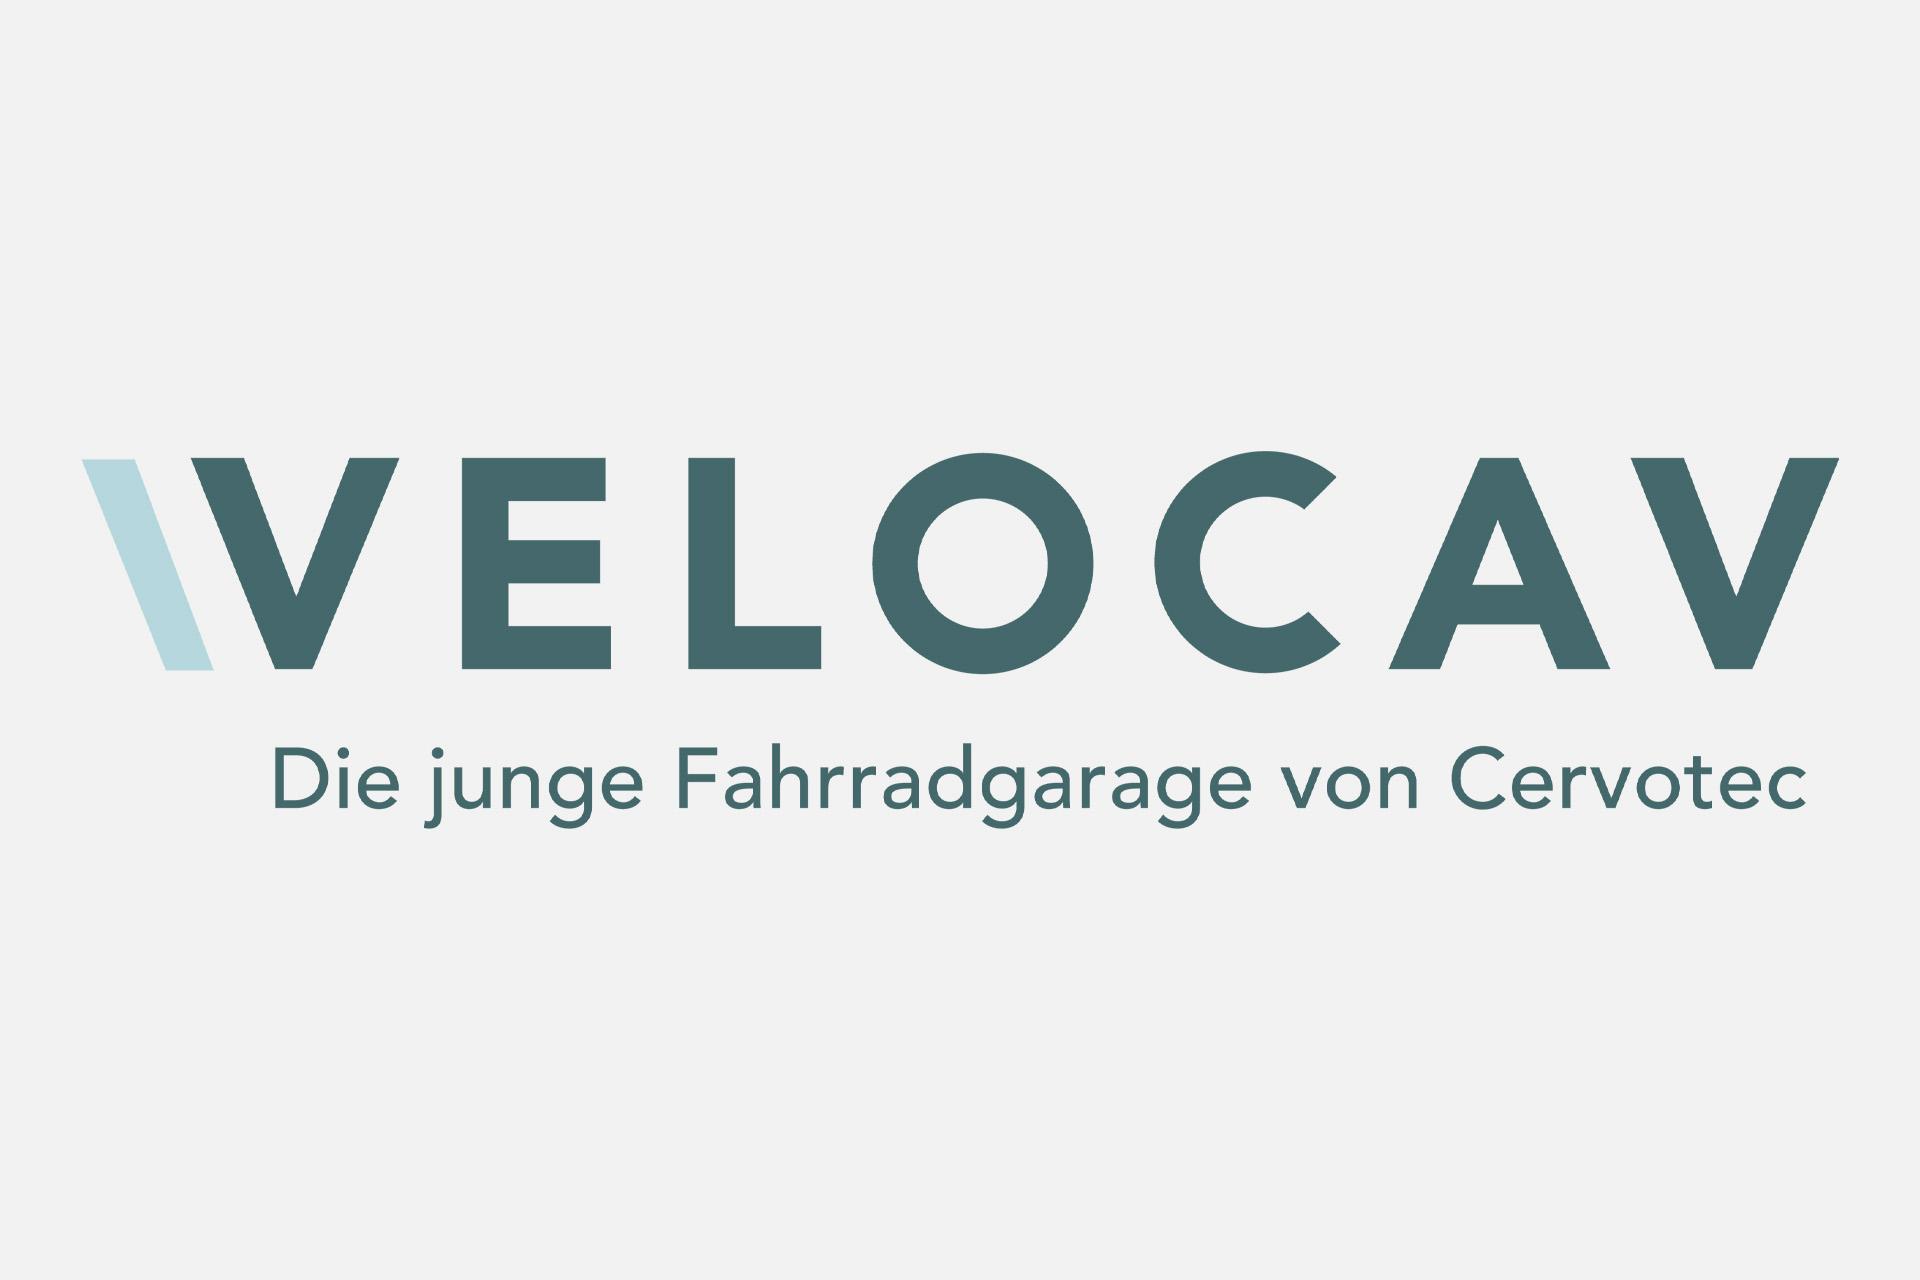 Design, Logoentwicklung, Corporate Design, Studio Auckz